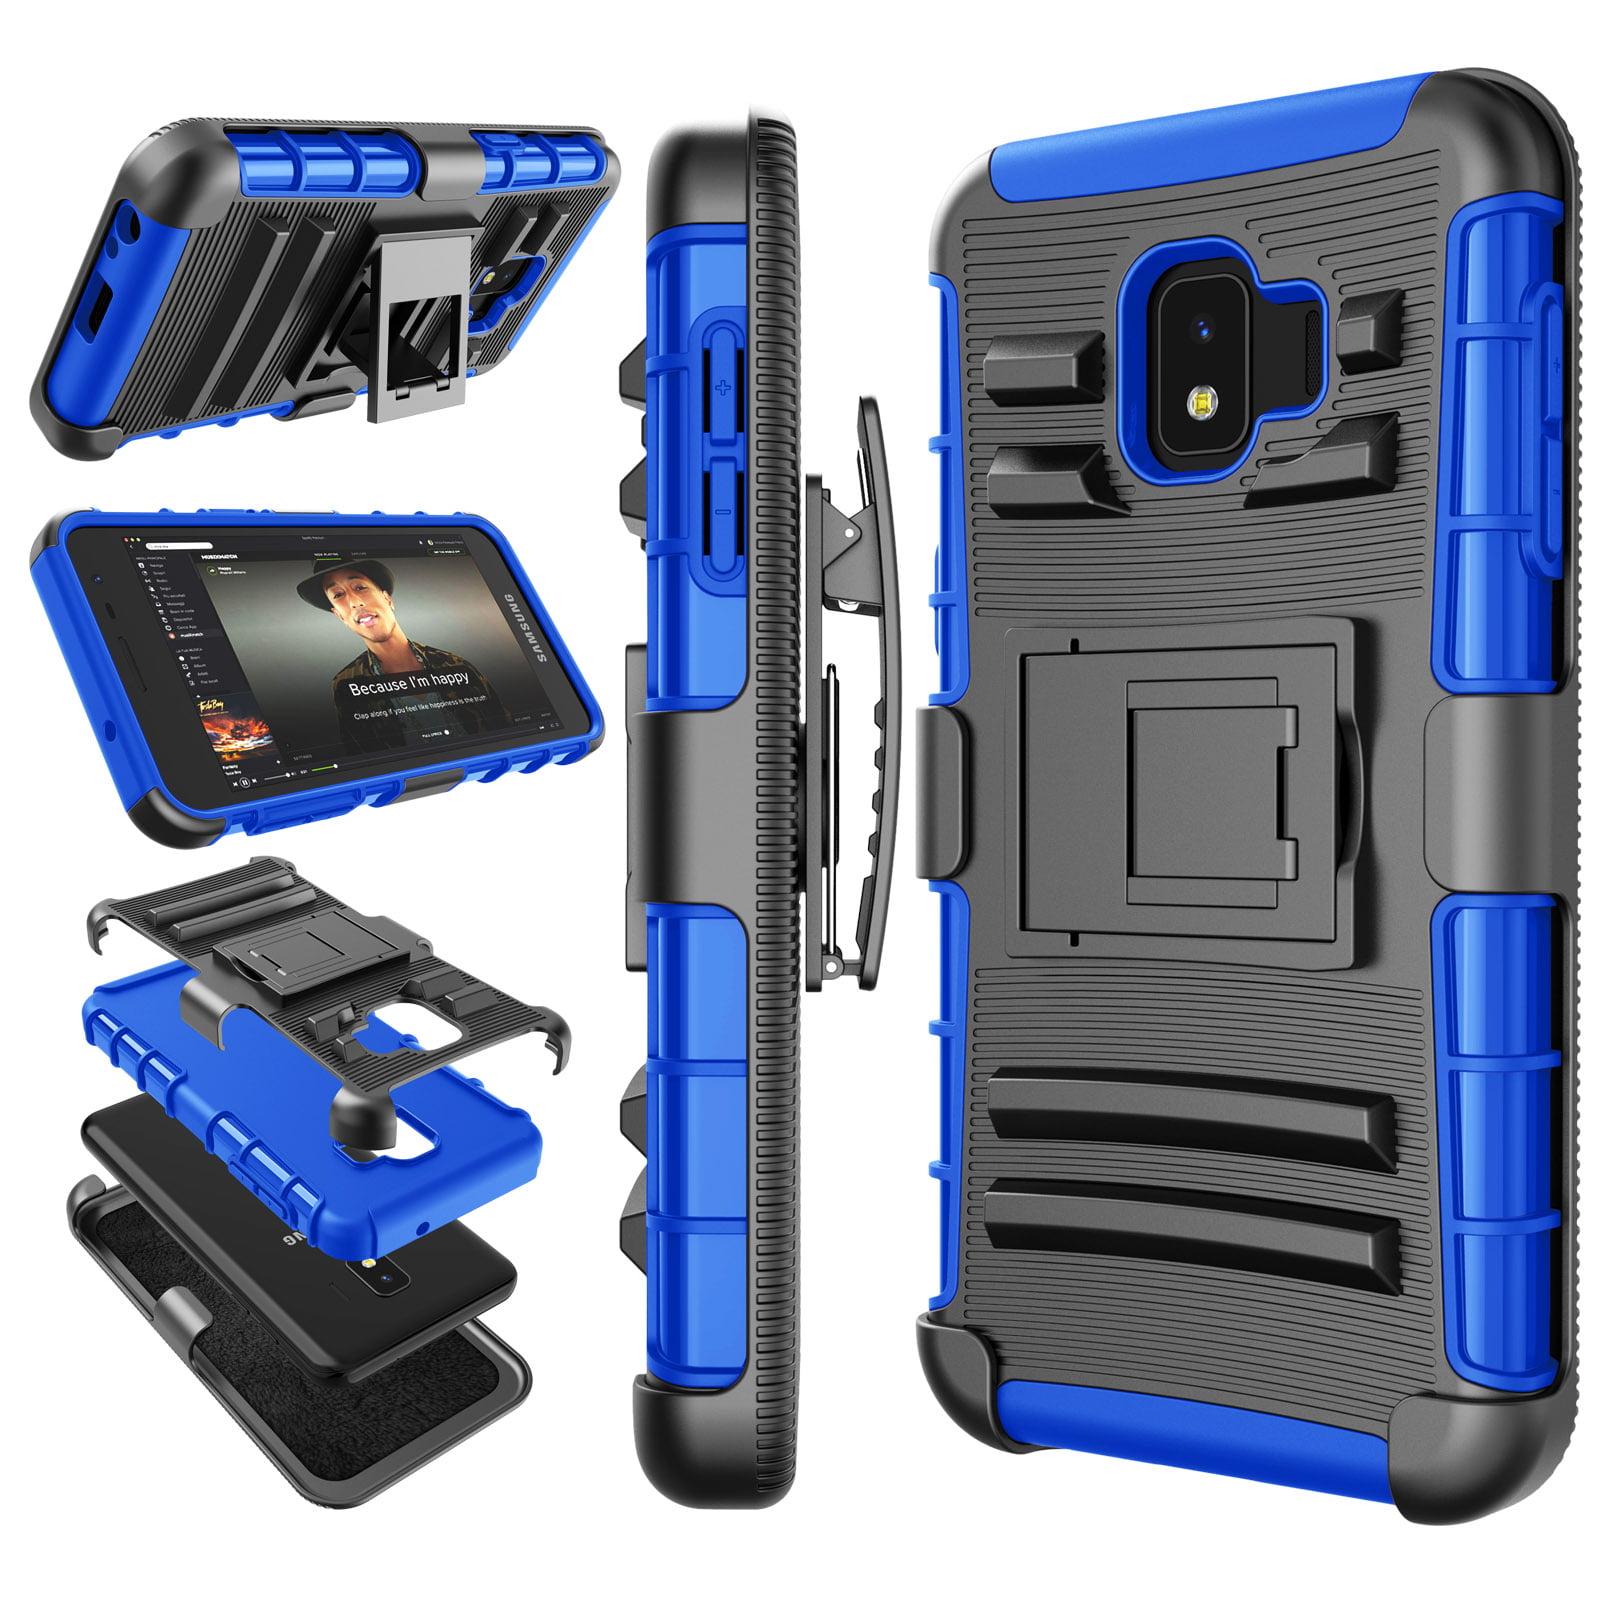 Galaxy J2 Core Case Samsung J2 Dash J2 Pure J260 Holster Clip Tekcoo Hoplite Swivel Locking Belt Defender Full Body Kickstand Carrying Camouflage Armor Sturdy Phone Cases Cover Camo